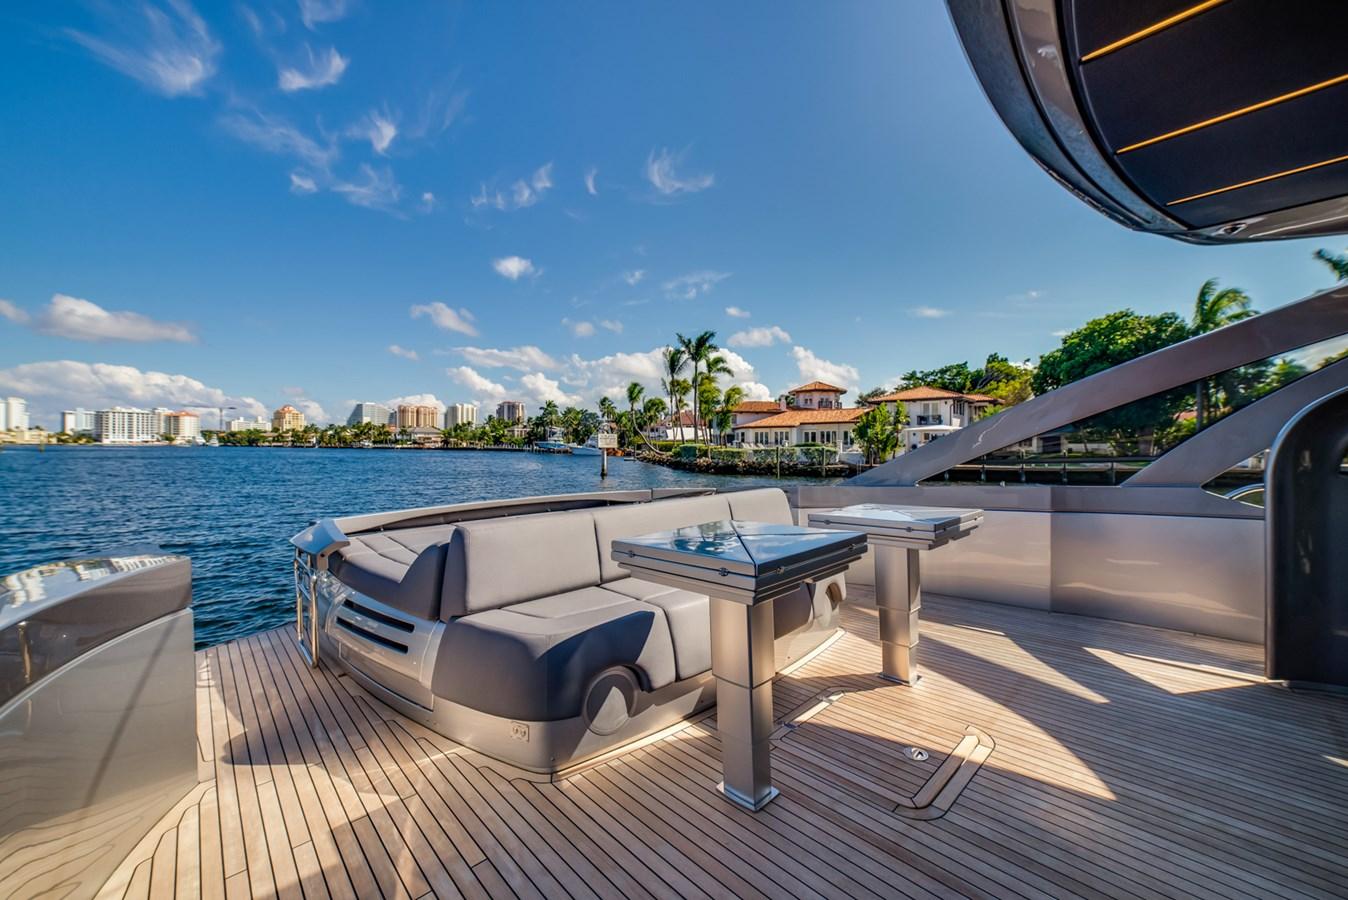 Aft Deck  2017 PERSHING Motor yacht Motor Yacht 2717029